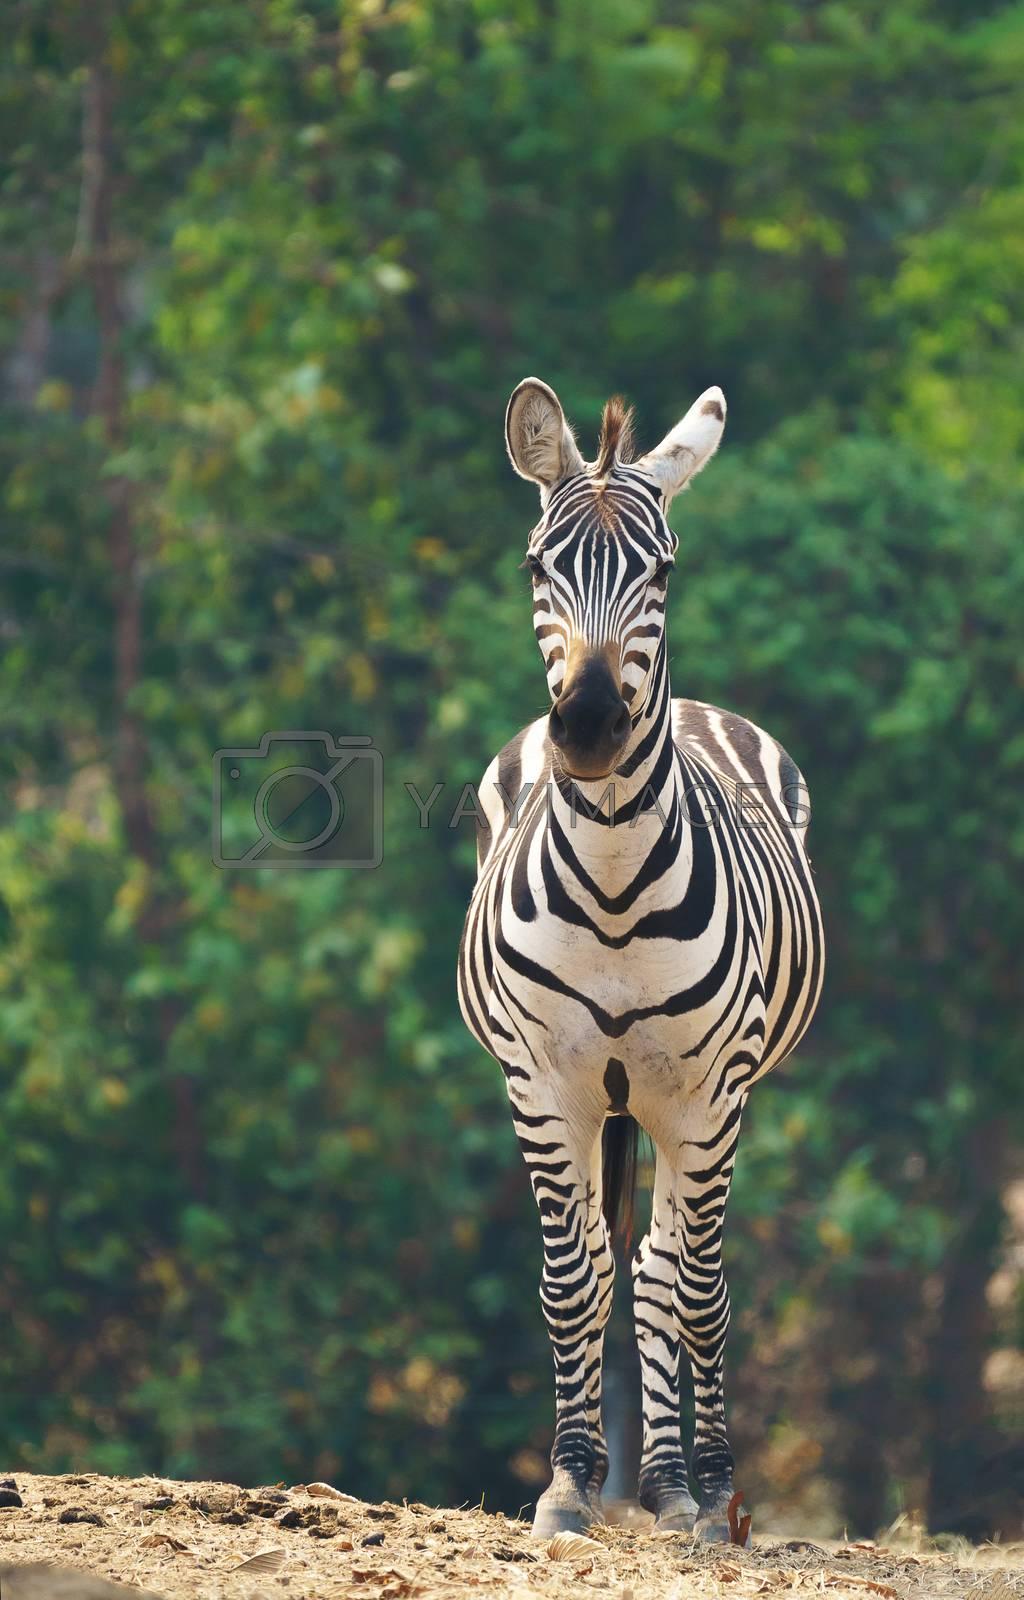 zebra standing alone in zoo